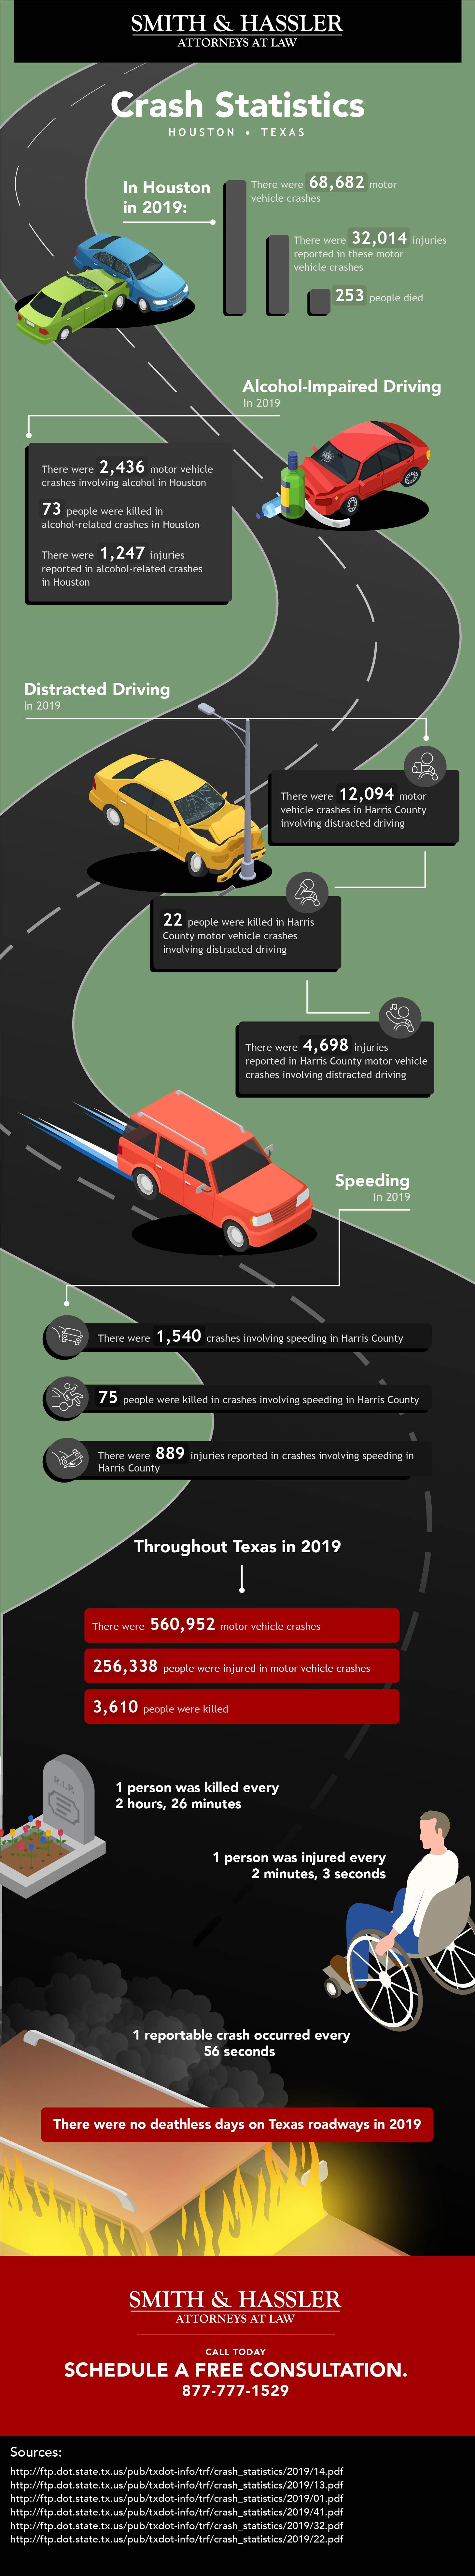 Crash Statistics infographic